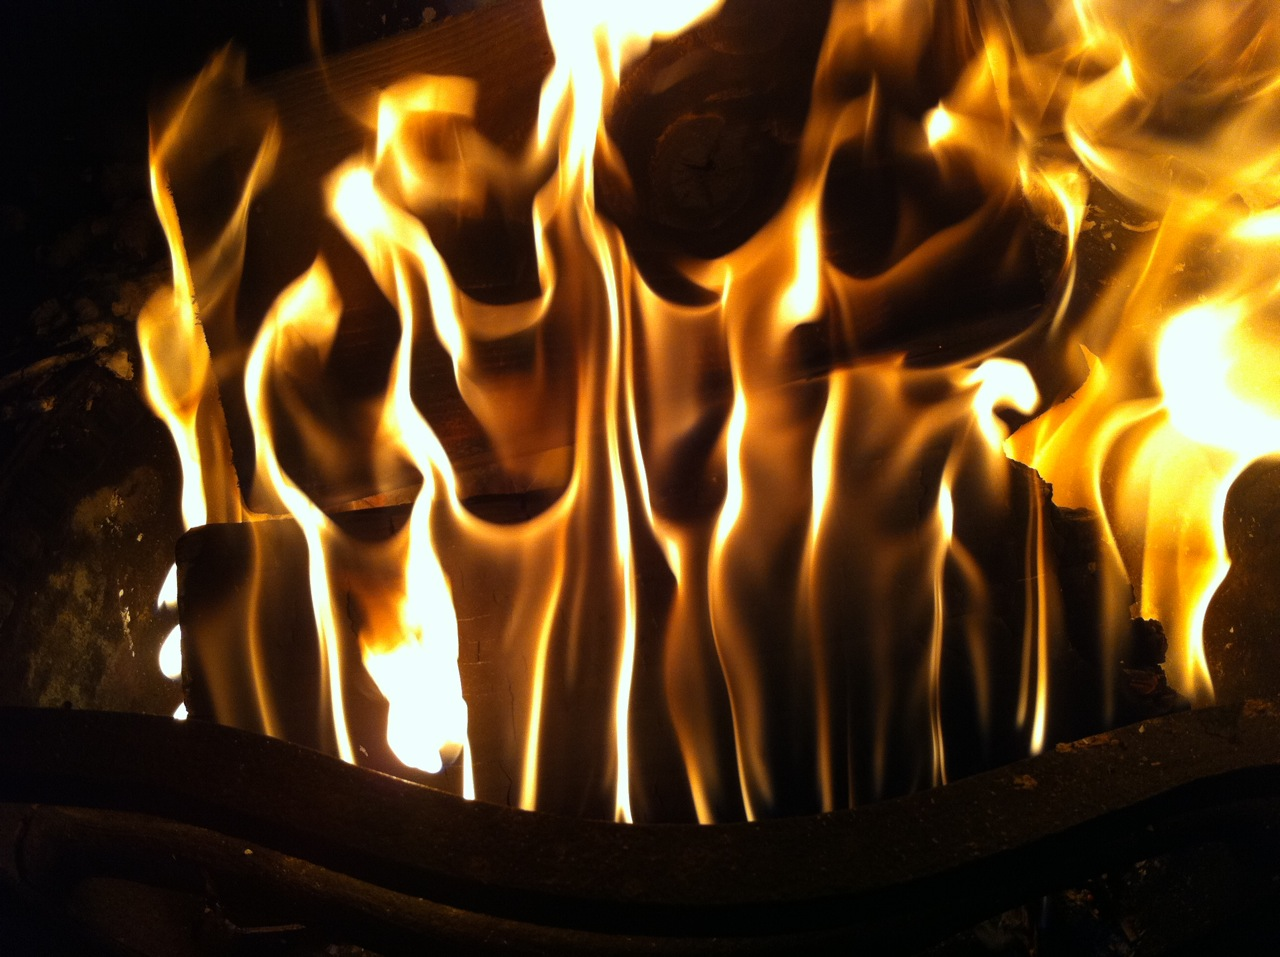 fire community: